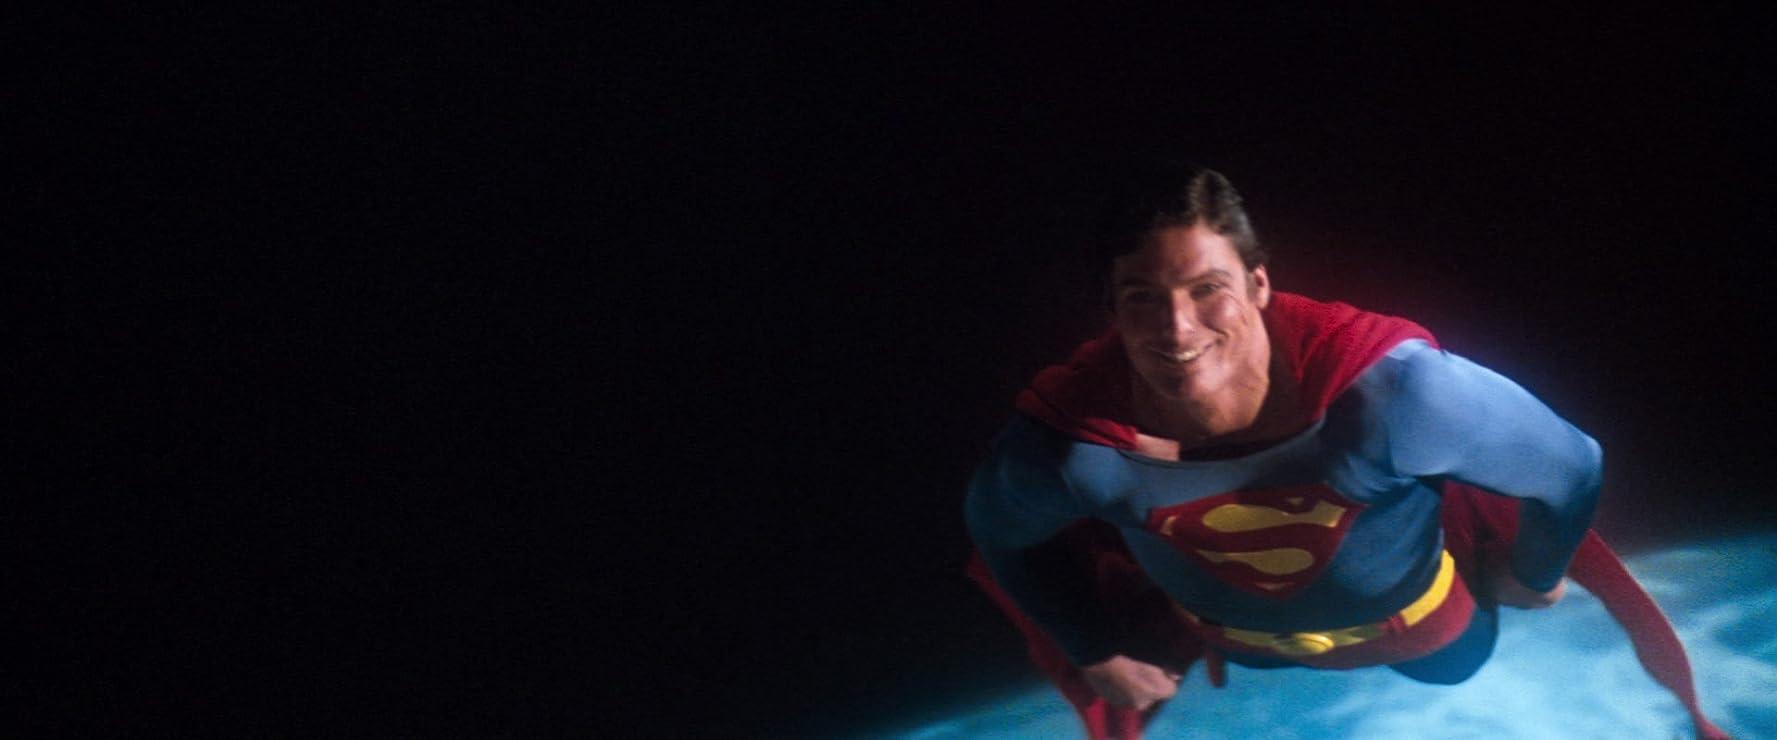 Image result for Christopher Reeve Superman smiling